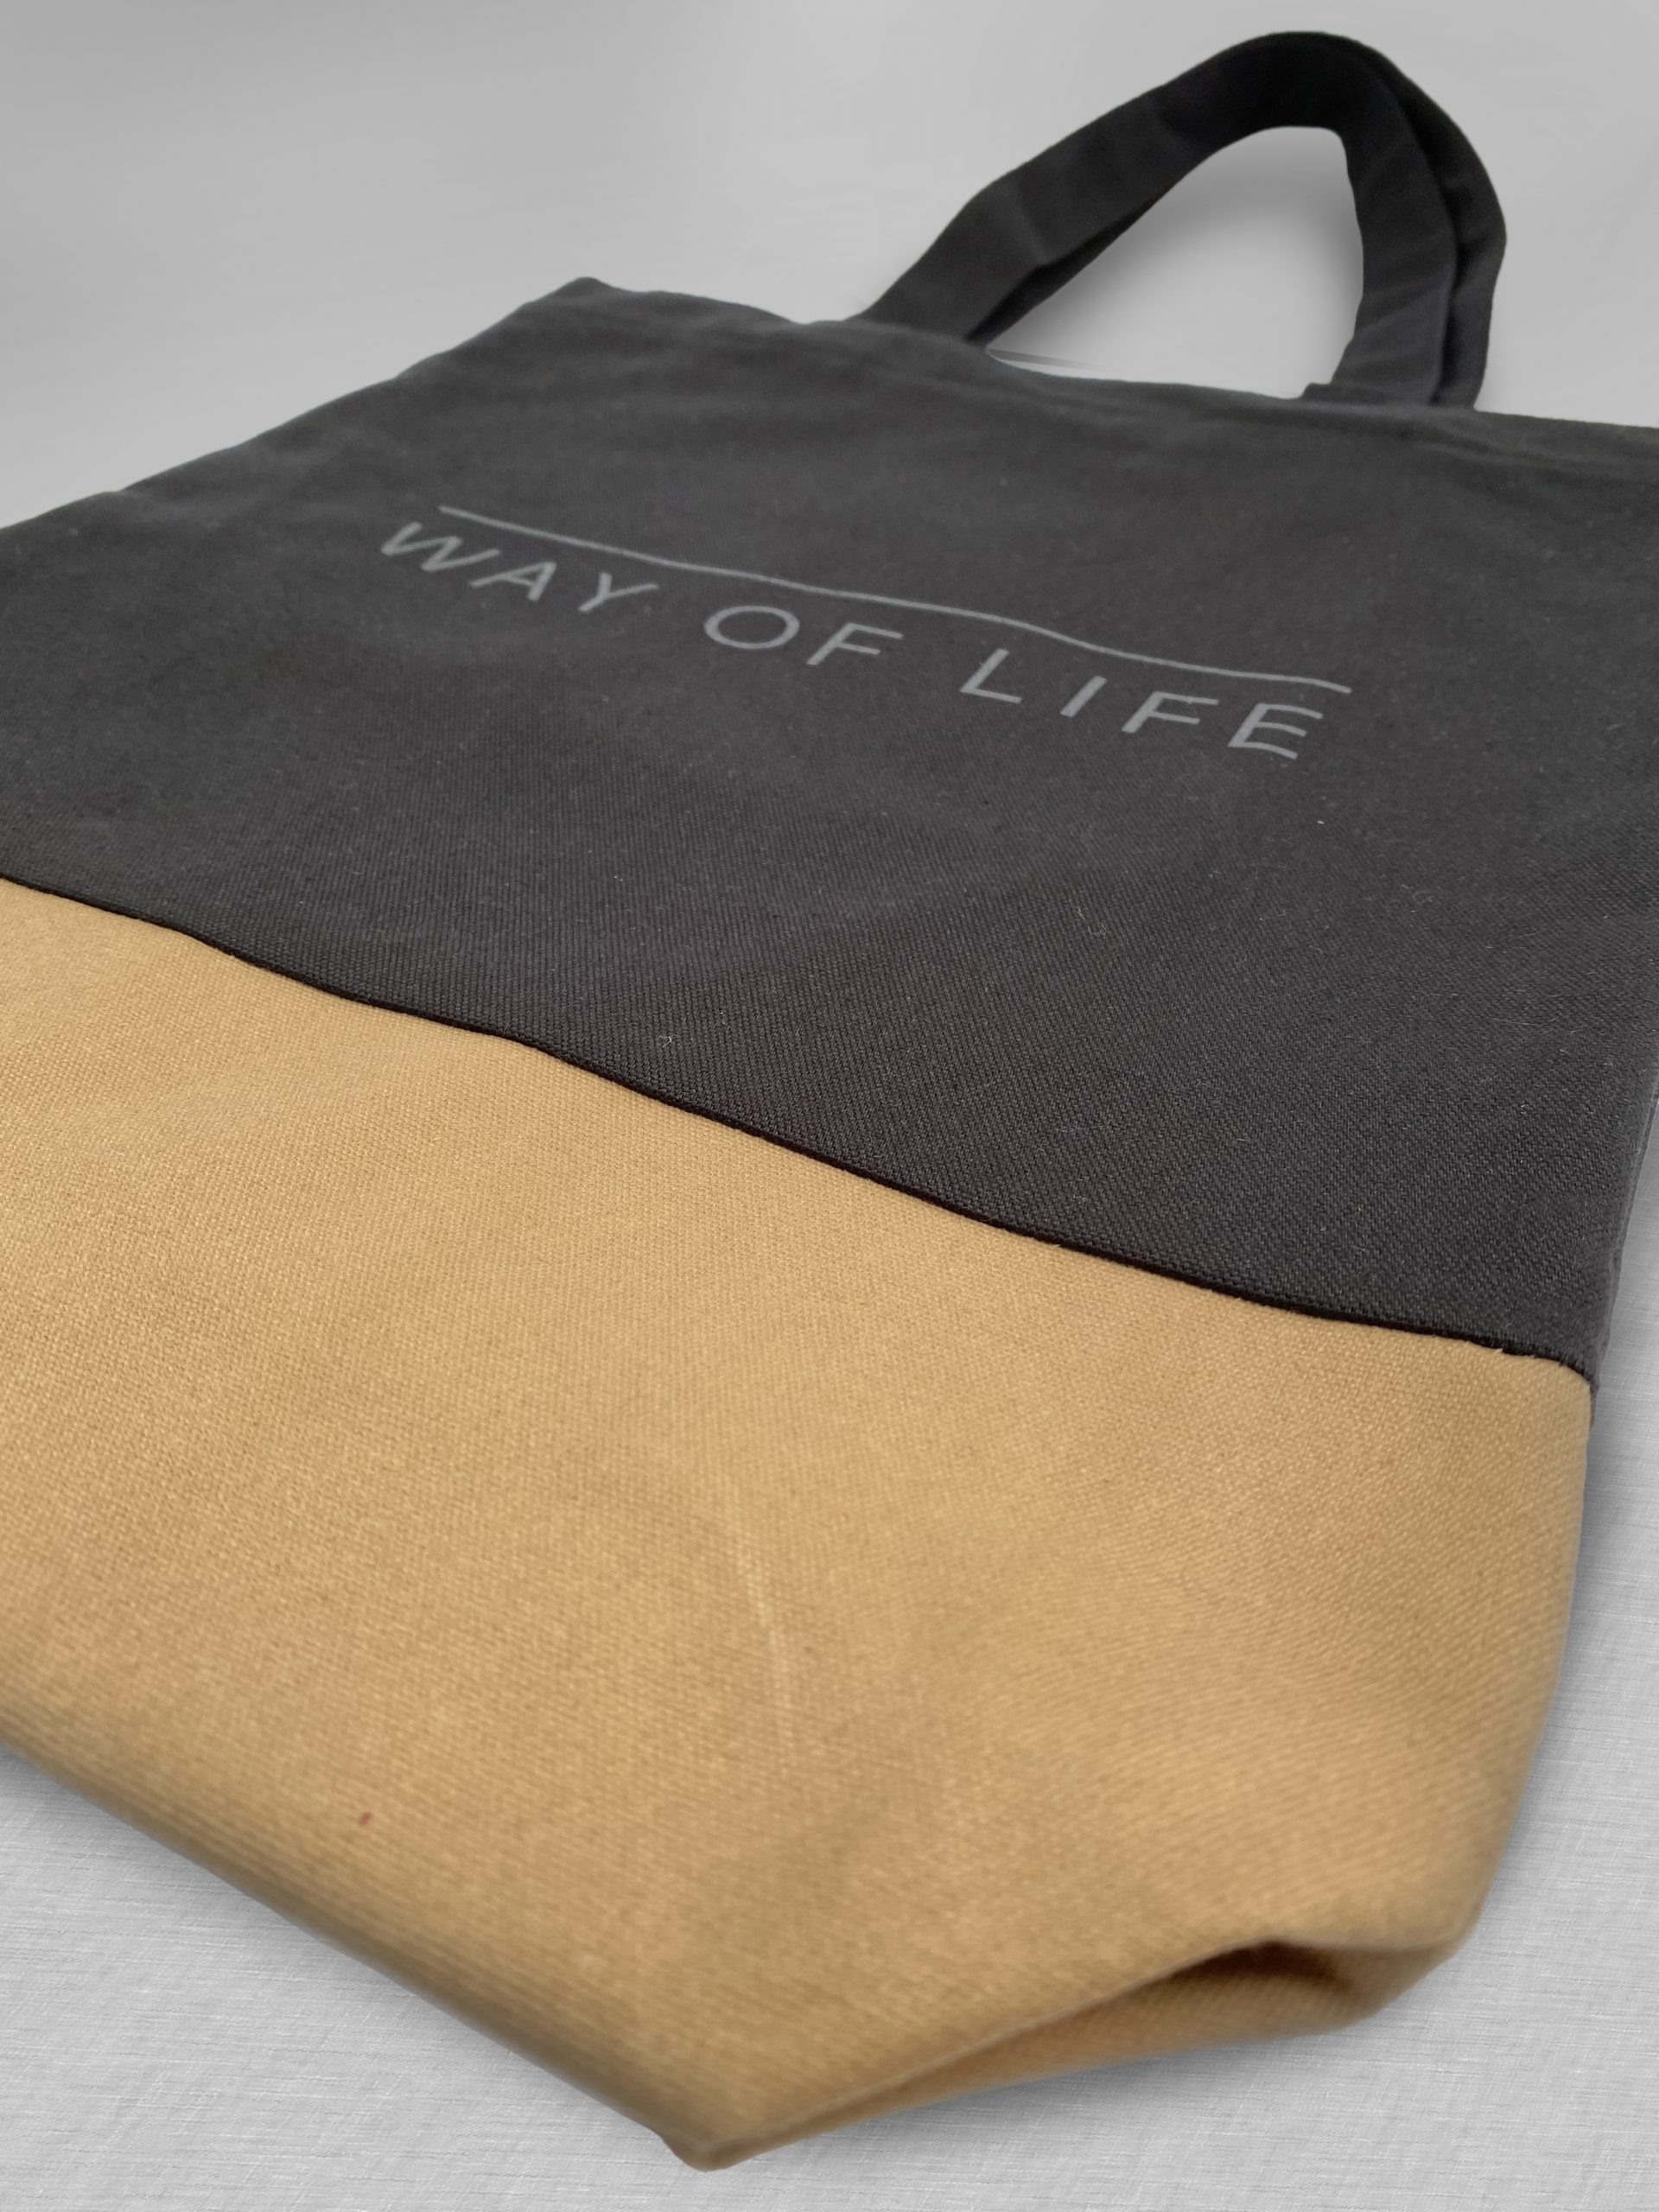 Here Designs printed tote bag